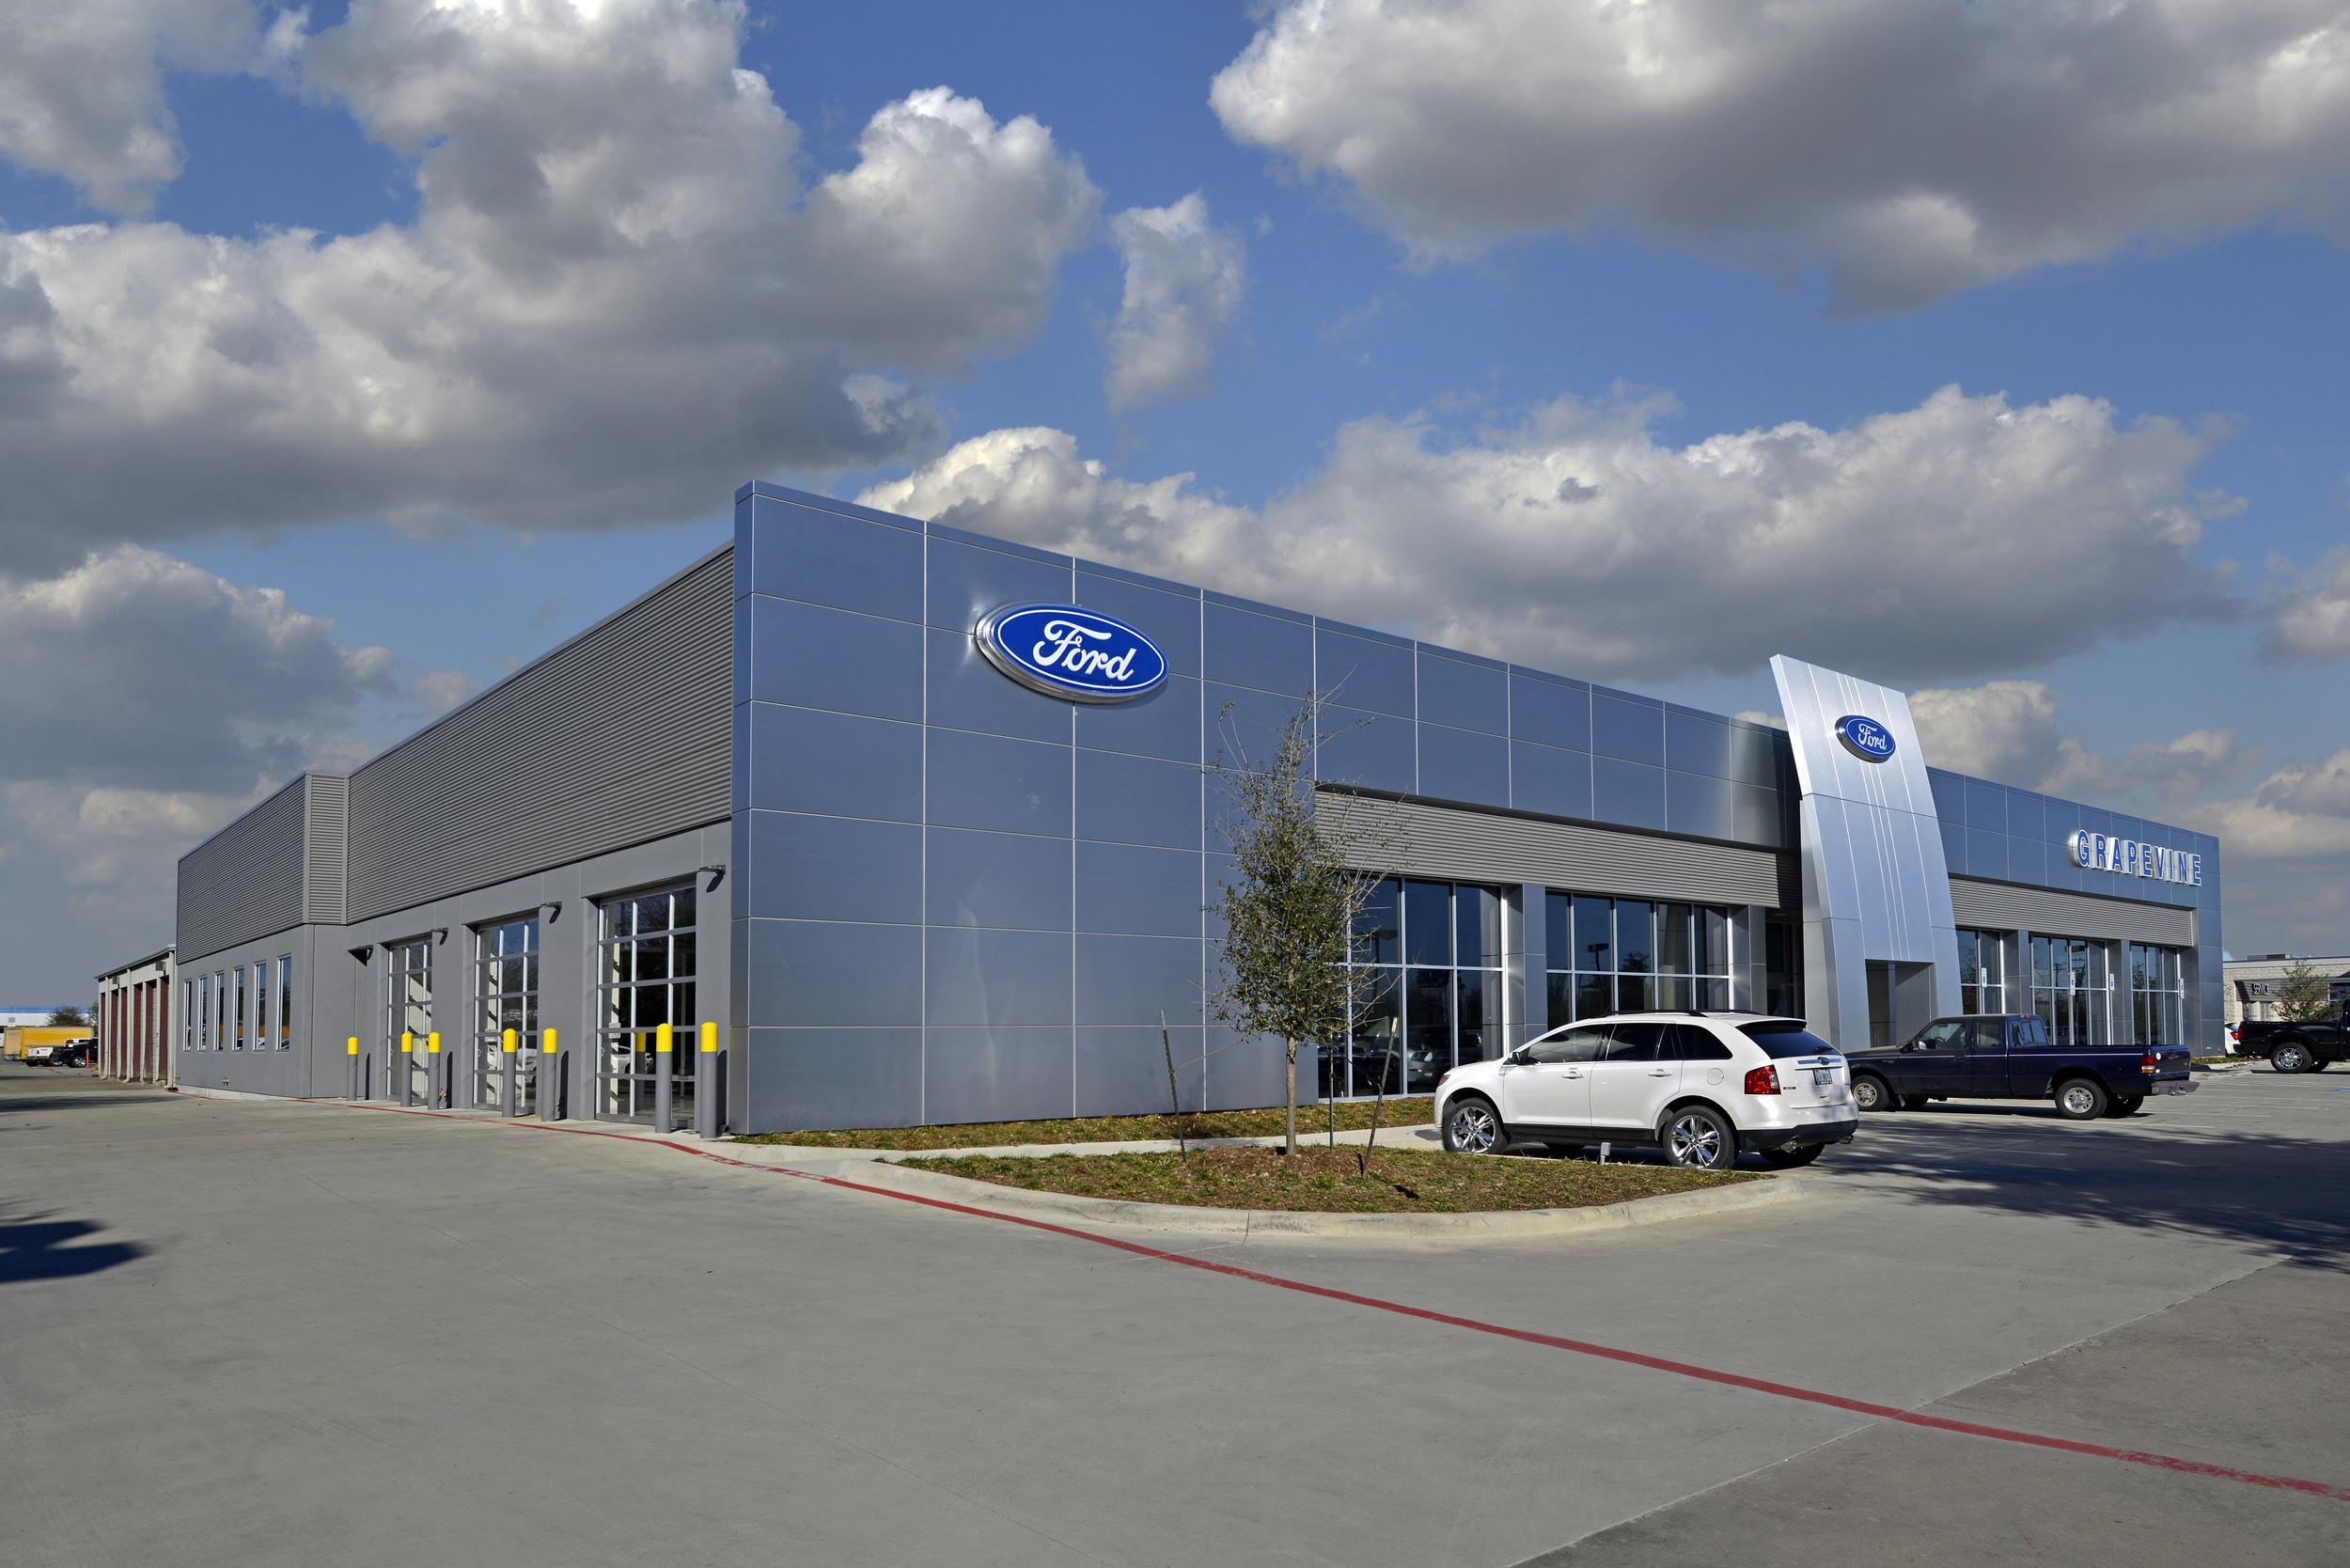 Grapevine Ford, Grapevine, TX